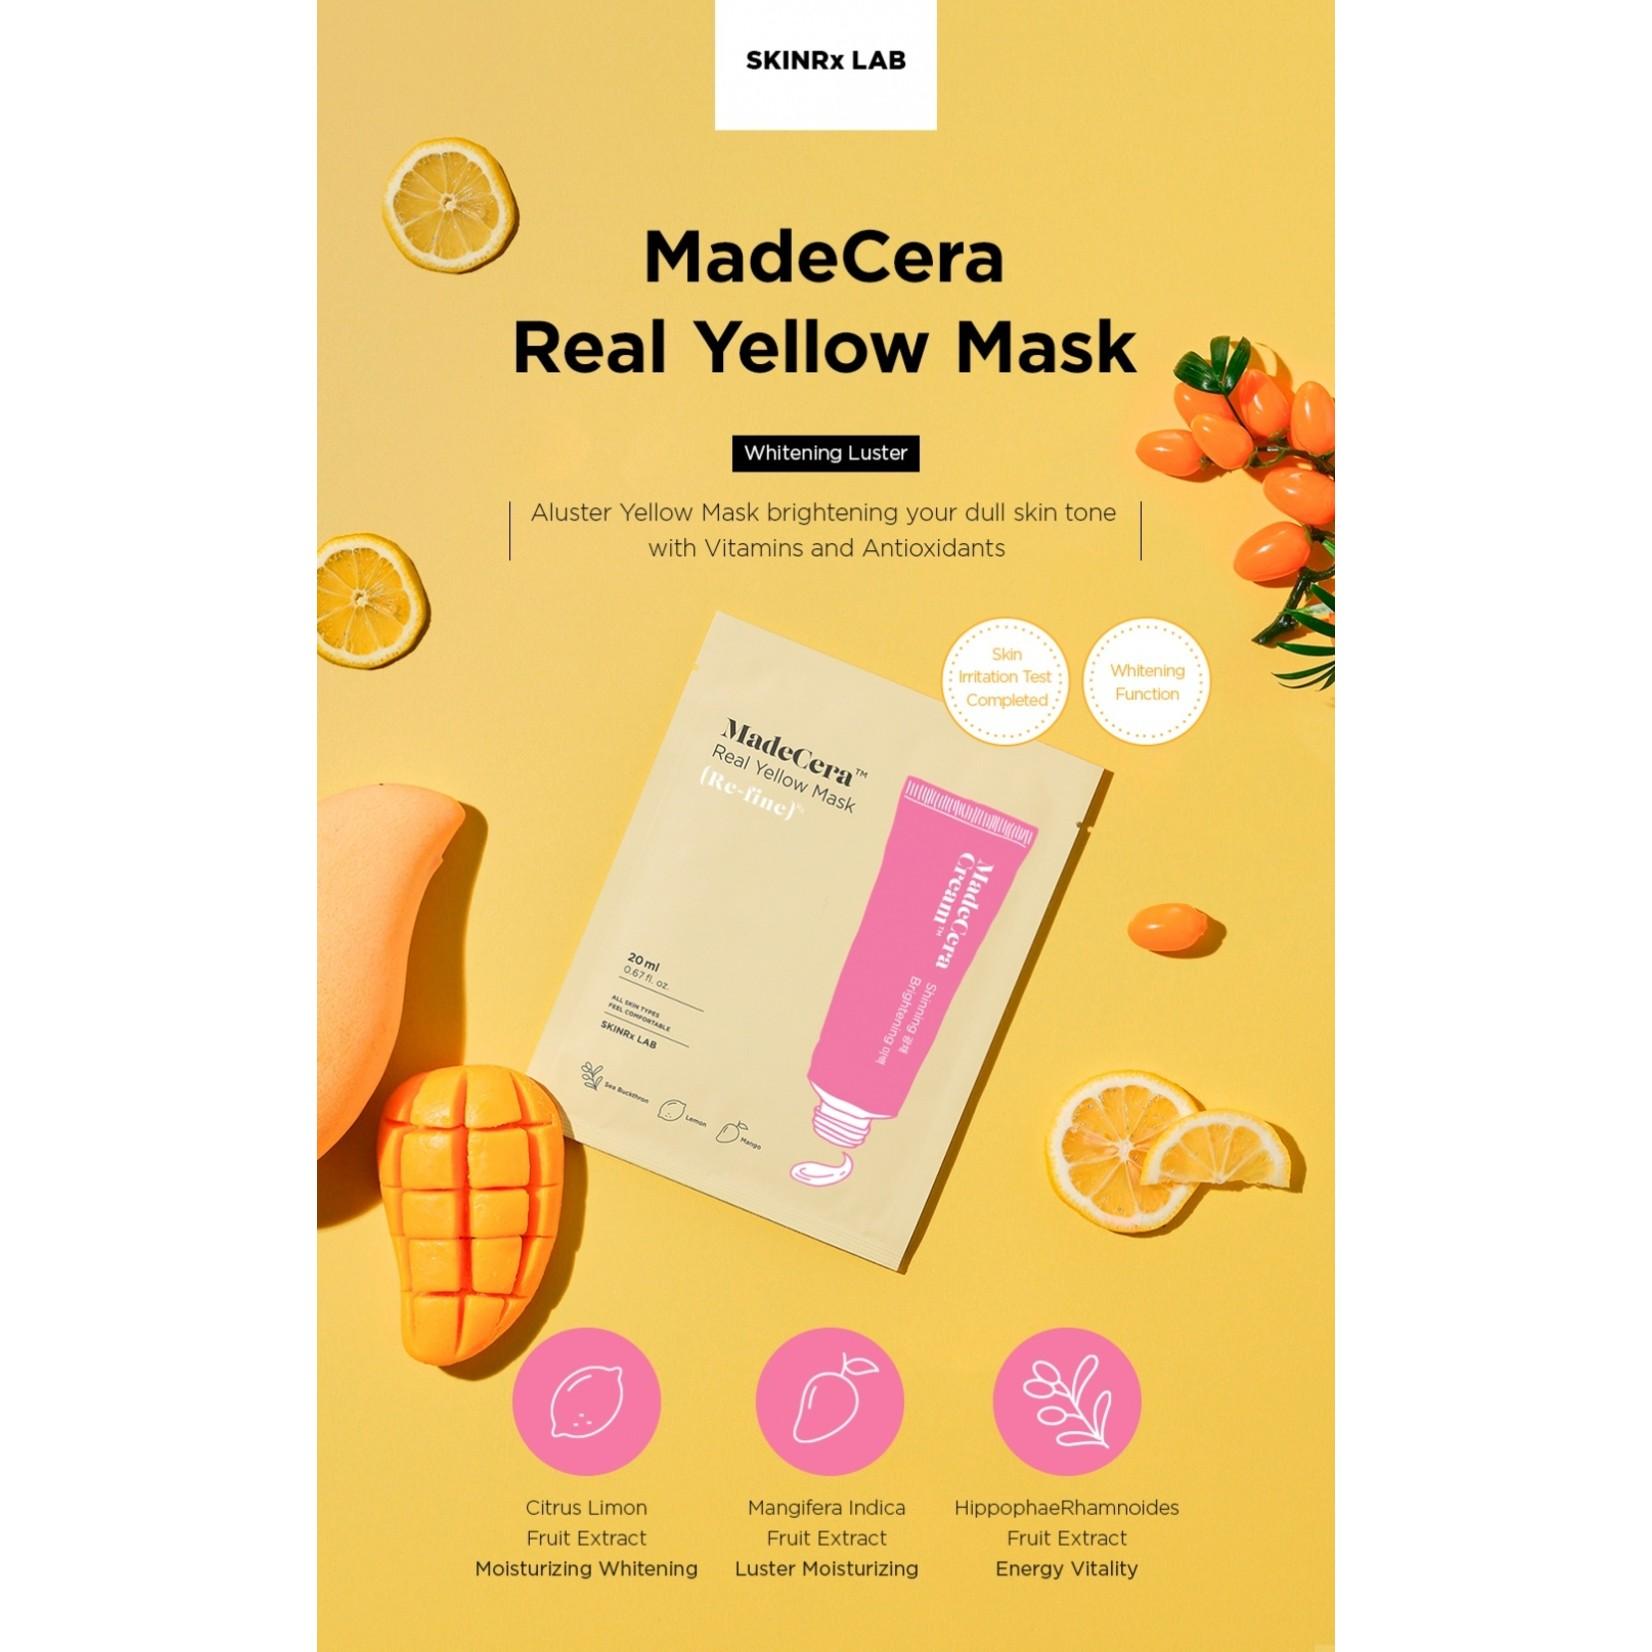 SKINRx LAB MadeCera Real Yellow Mask